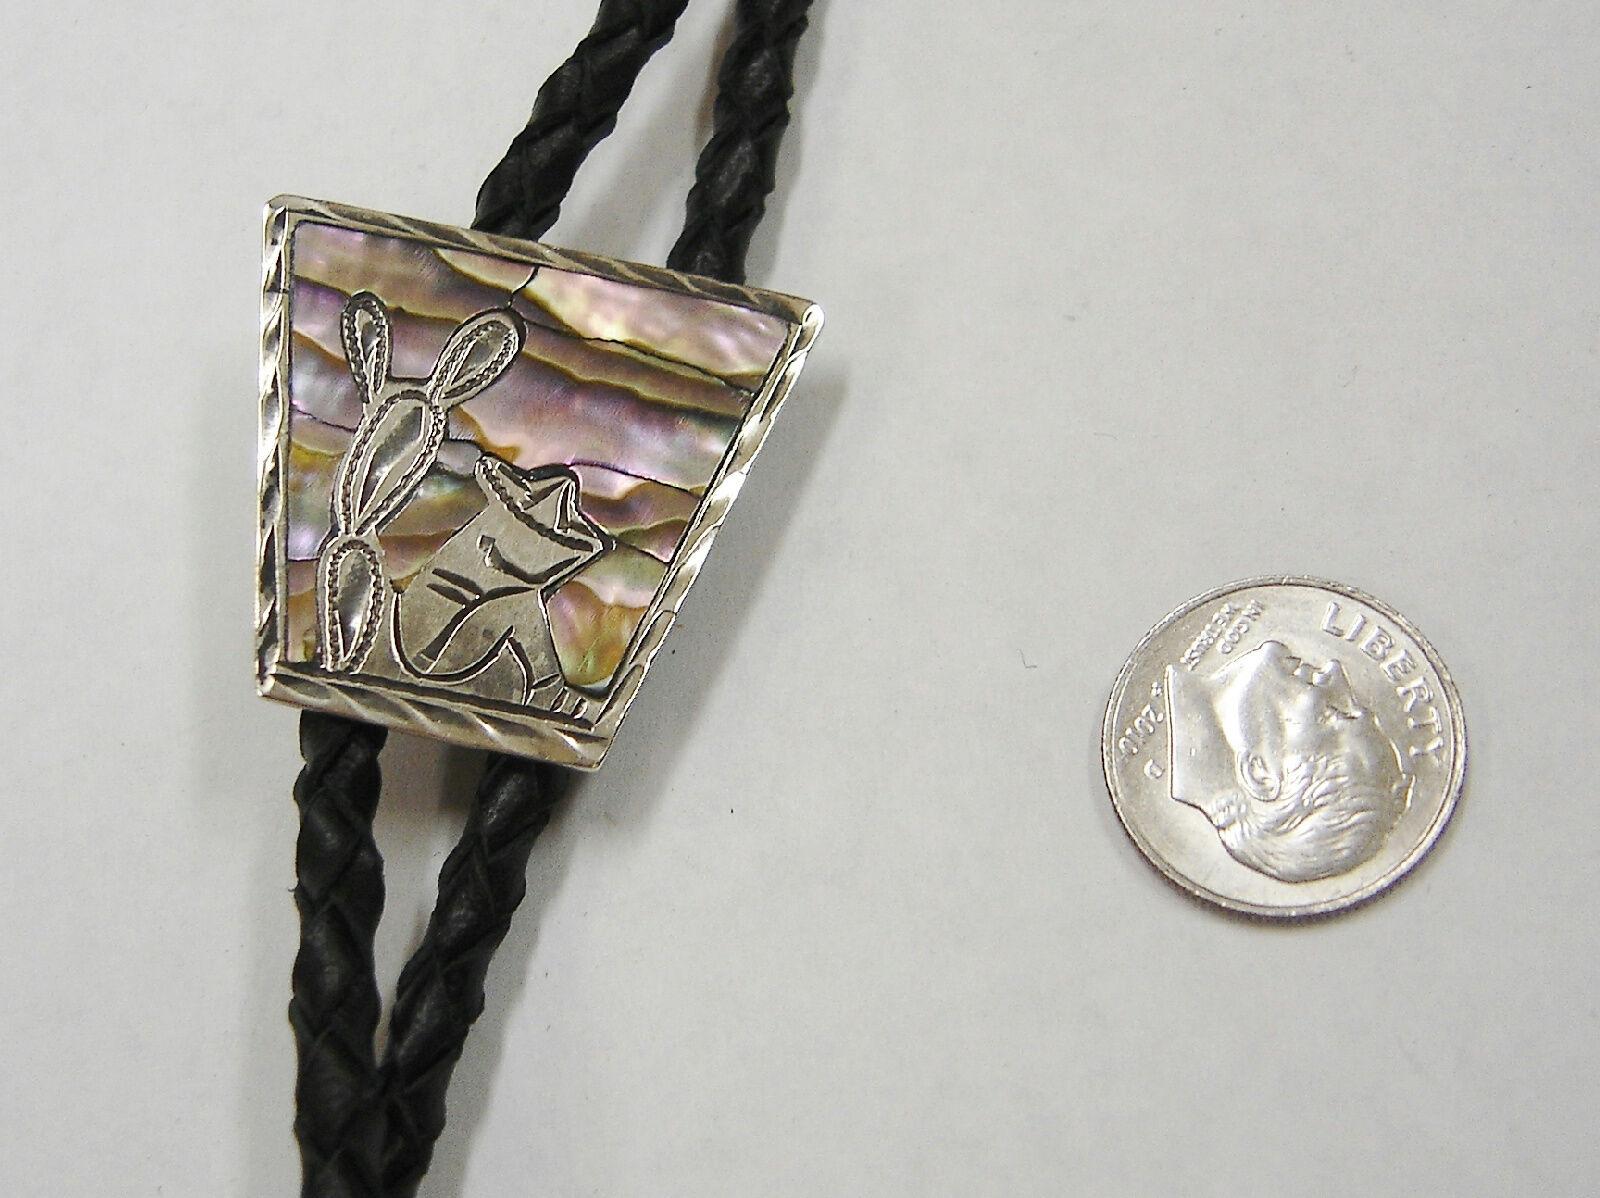 Sudest Scene Abalone argentoo argentoo argentoo Sterling Nero in pelle Bolo Cravatta N197-n 26c401